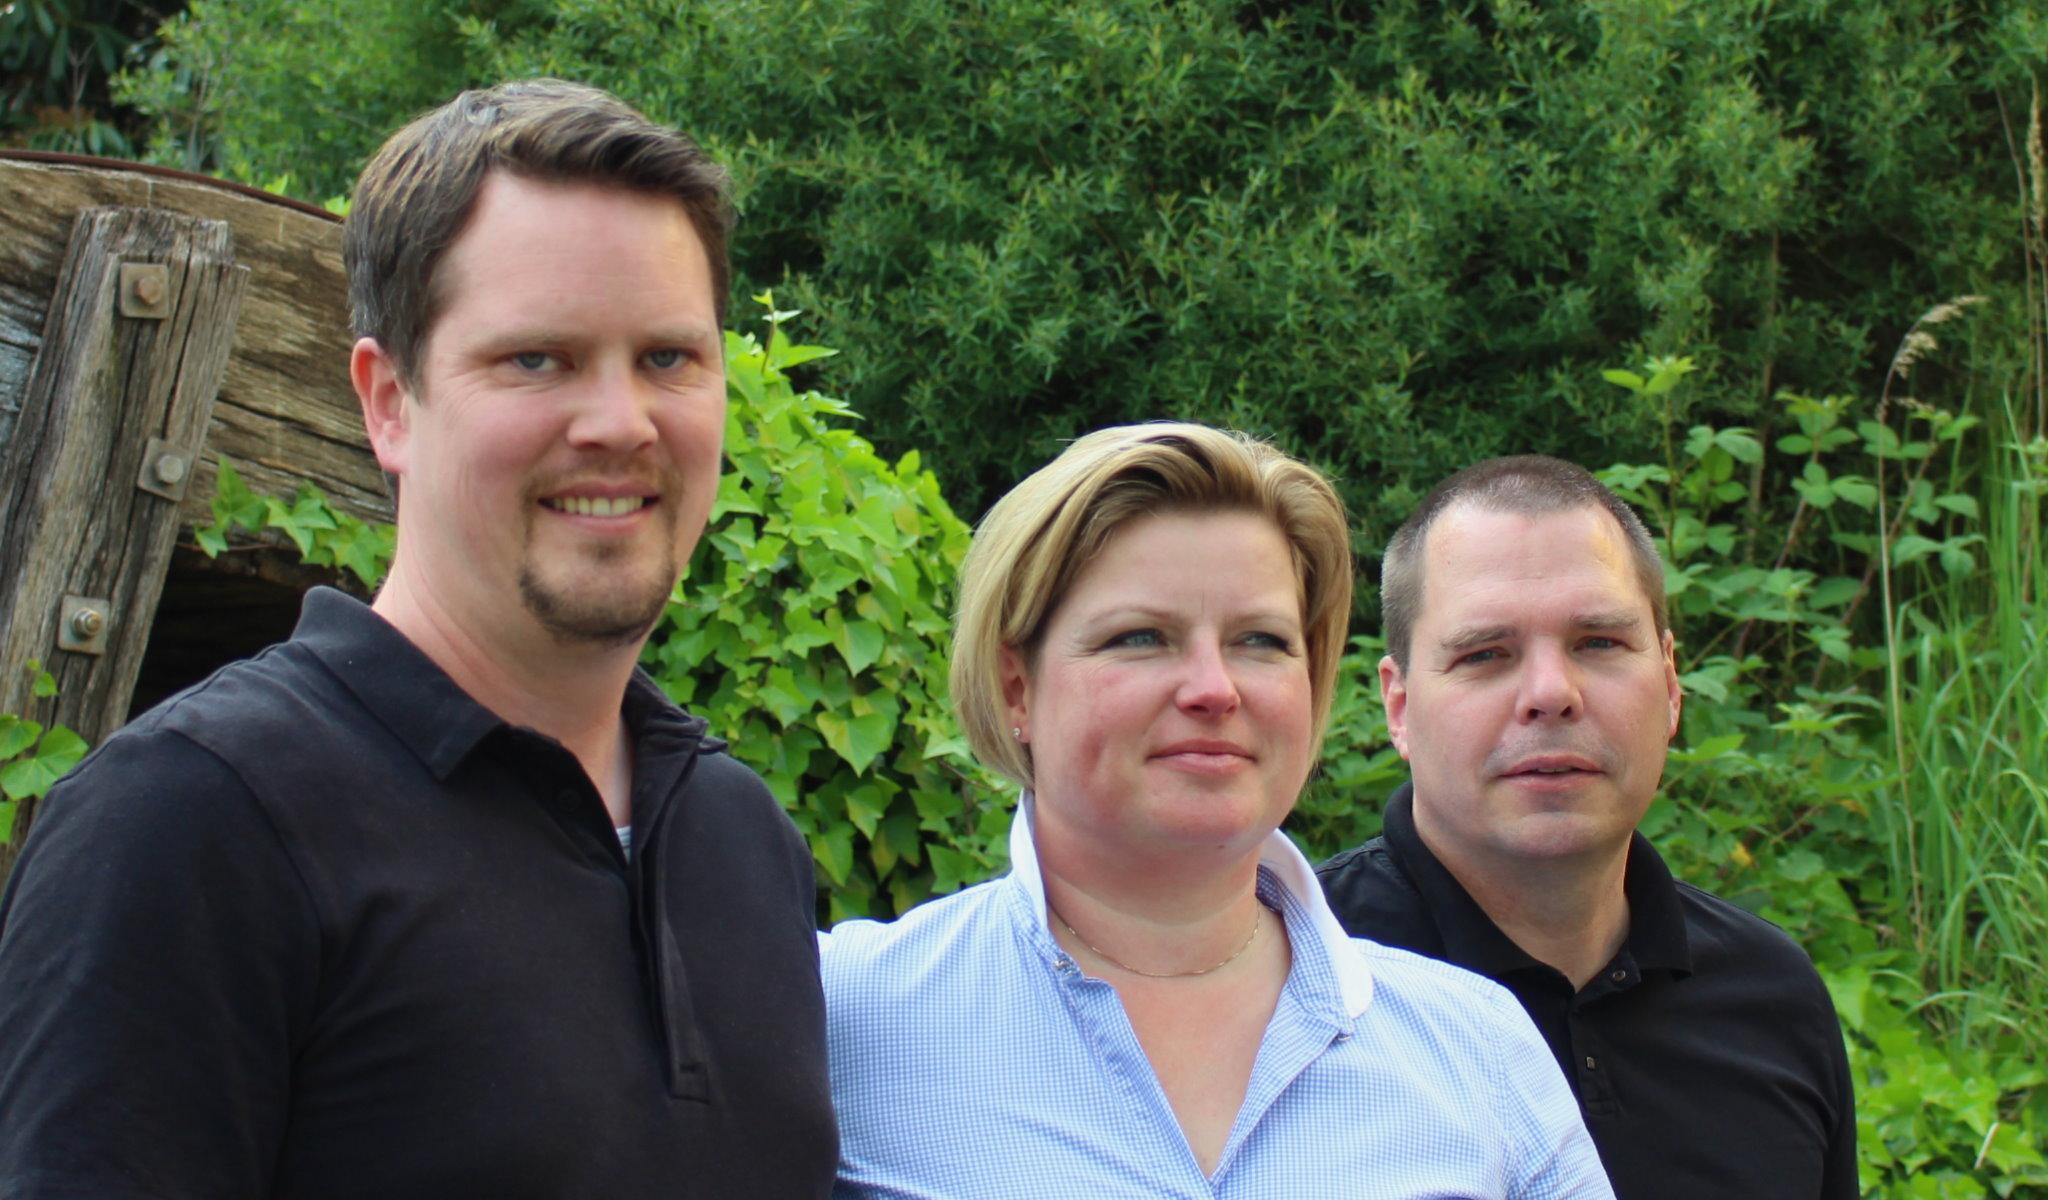 Das Team - Das INGenieurHaus - Dirk Witte - Kirsten Keller - Frank Borgert